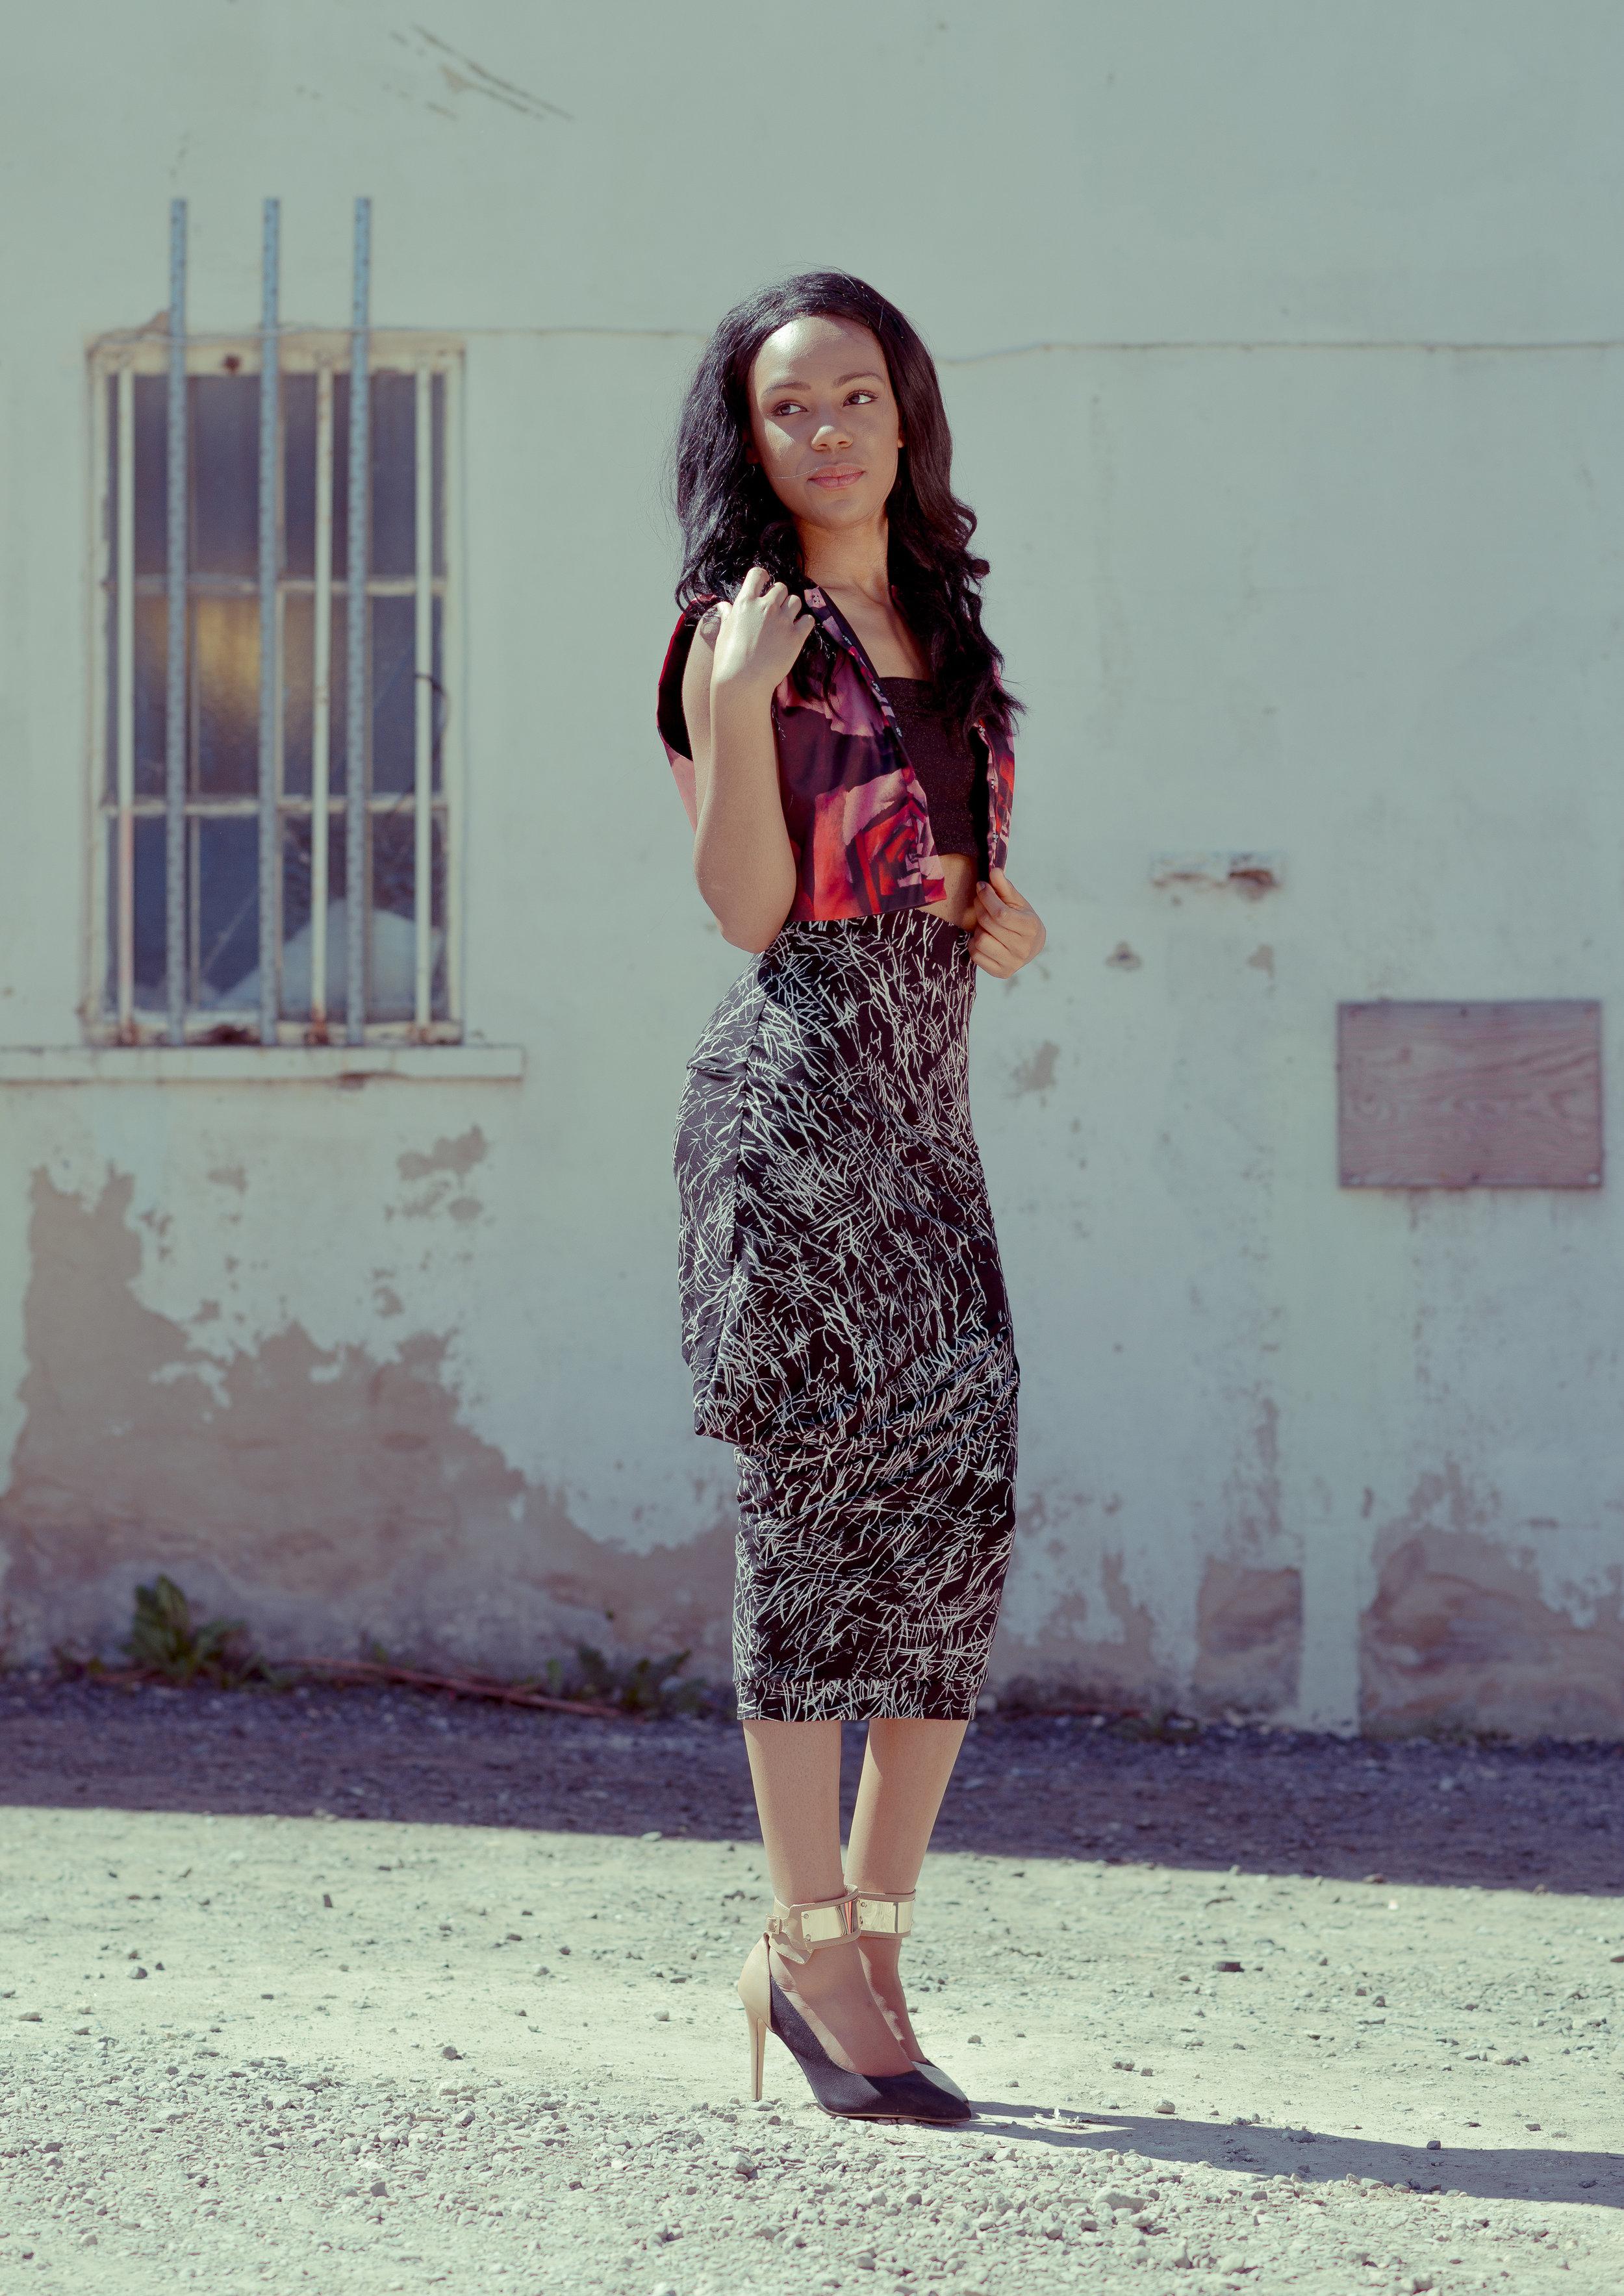 zaramia-ava-zaramiaava-leeds-fashion-designer-ethical-sustainable-tailored-minimalist-crop-top-black-print-point-skirt-black-jacket-belt-versatile-drape-cowl-styling-womenswear-models-12